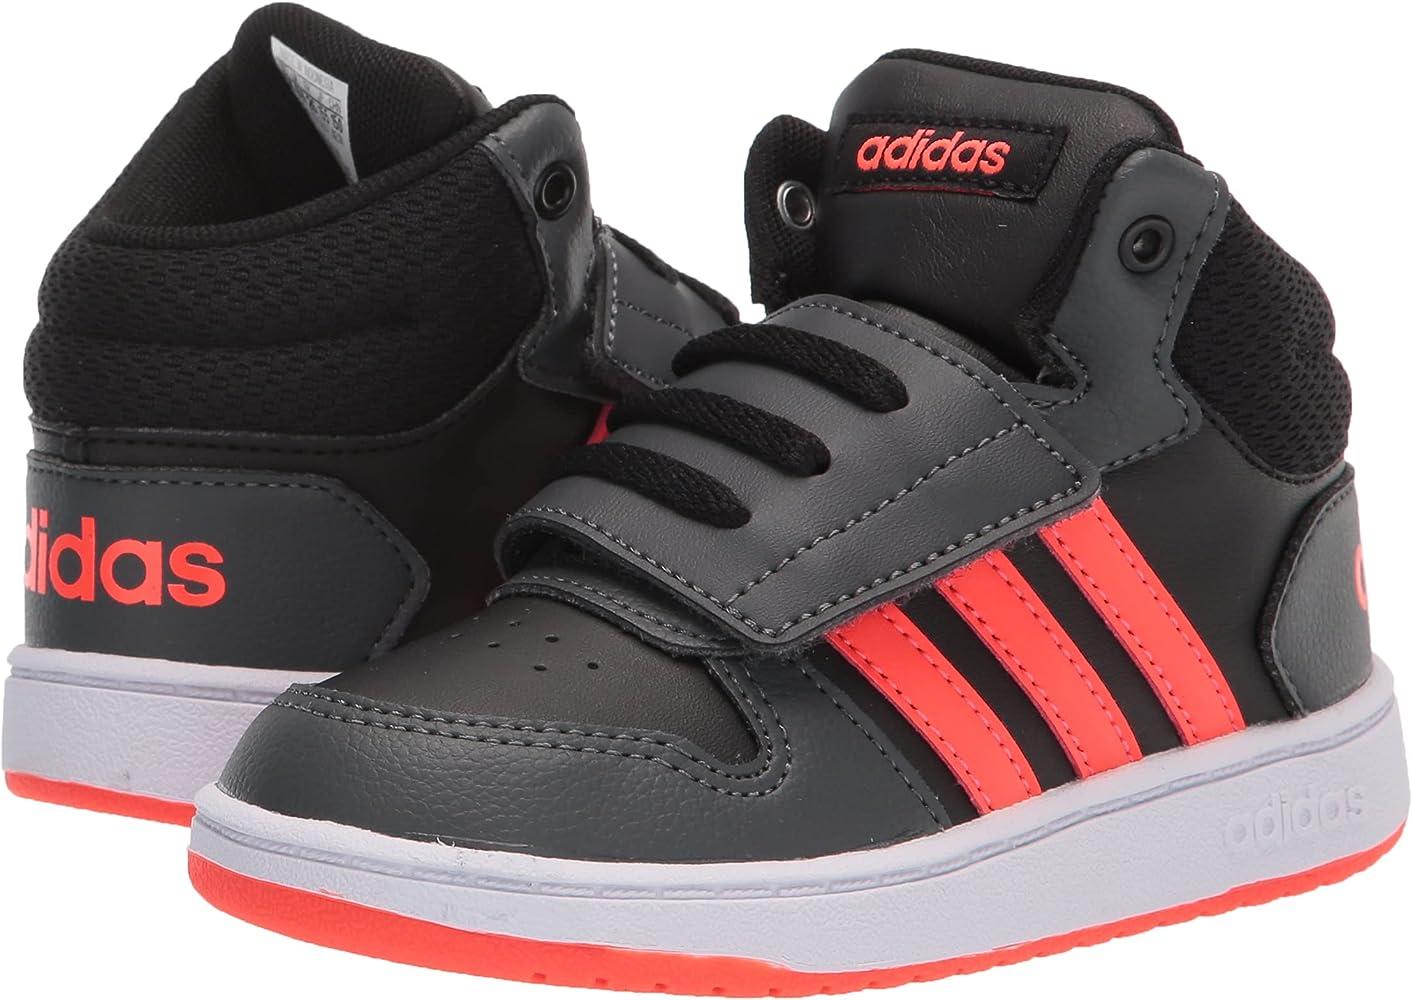 adidas Unisex-Child Hoops 2.0 Mid Basketball Shoe